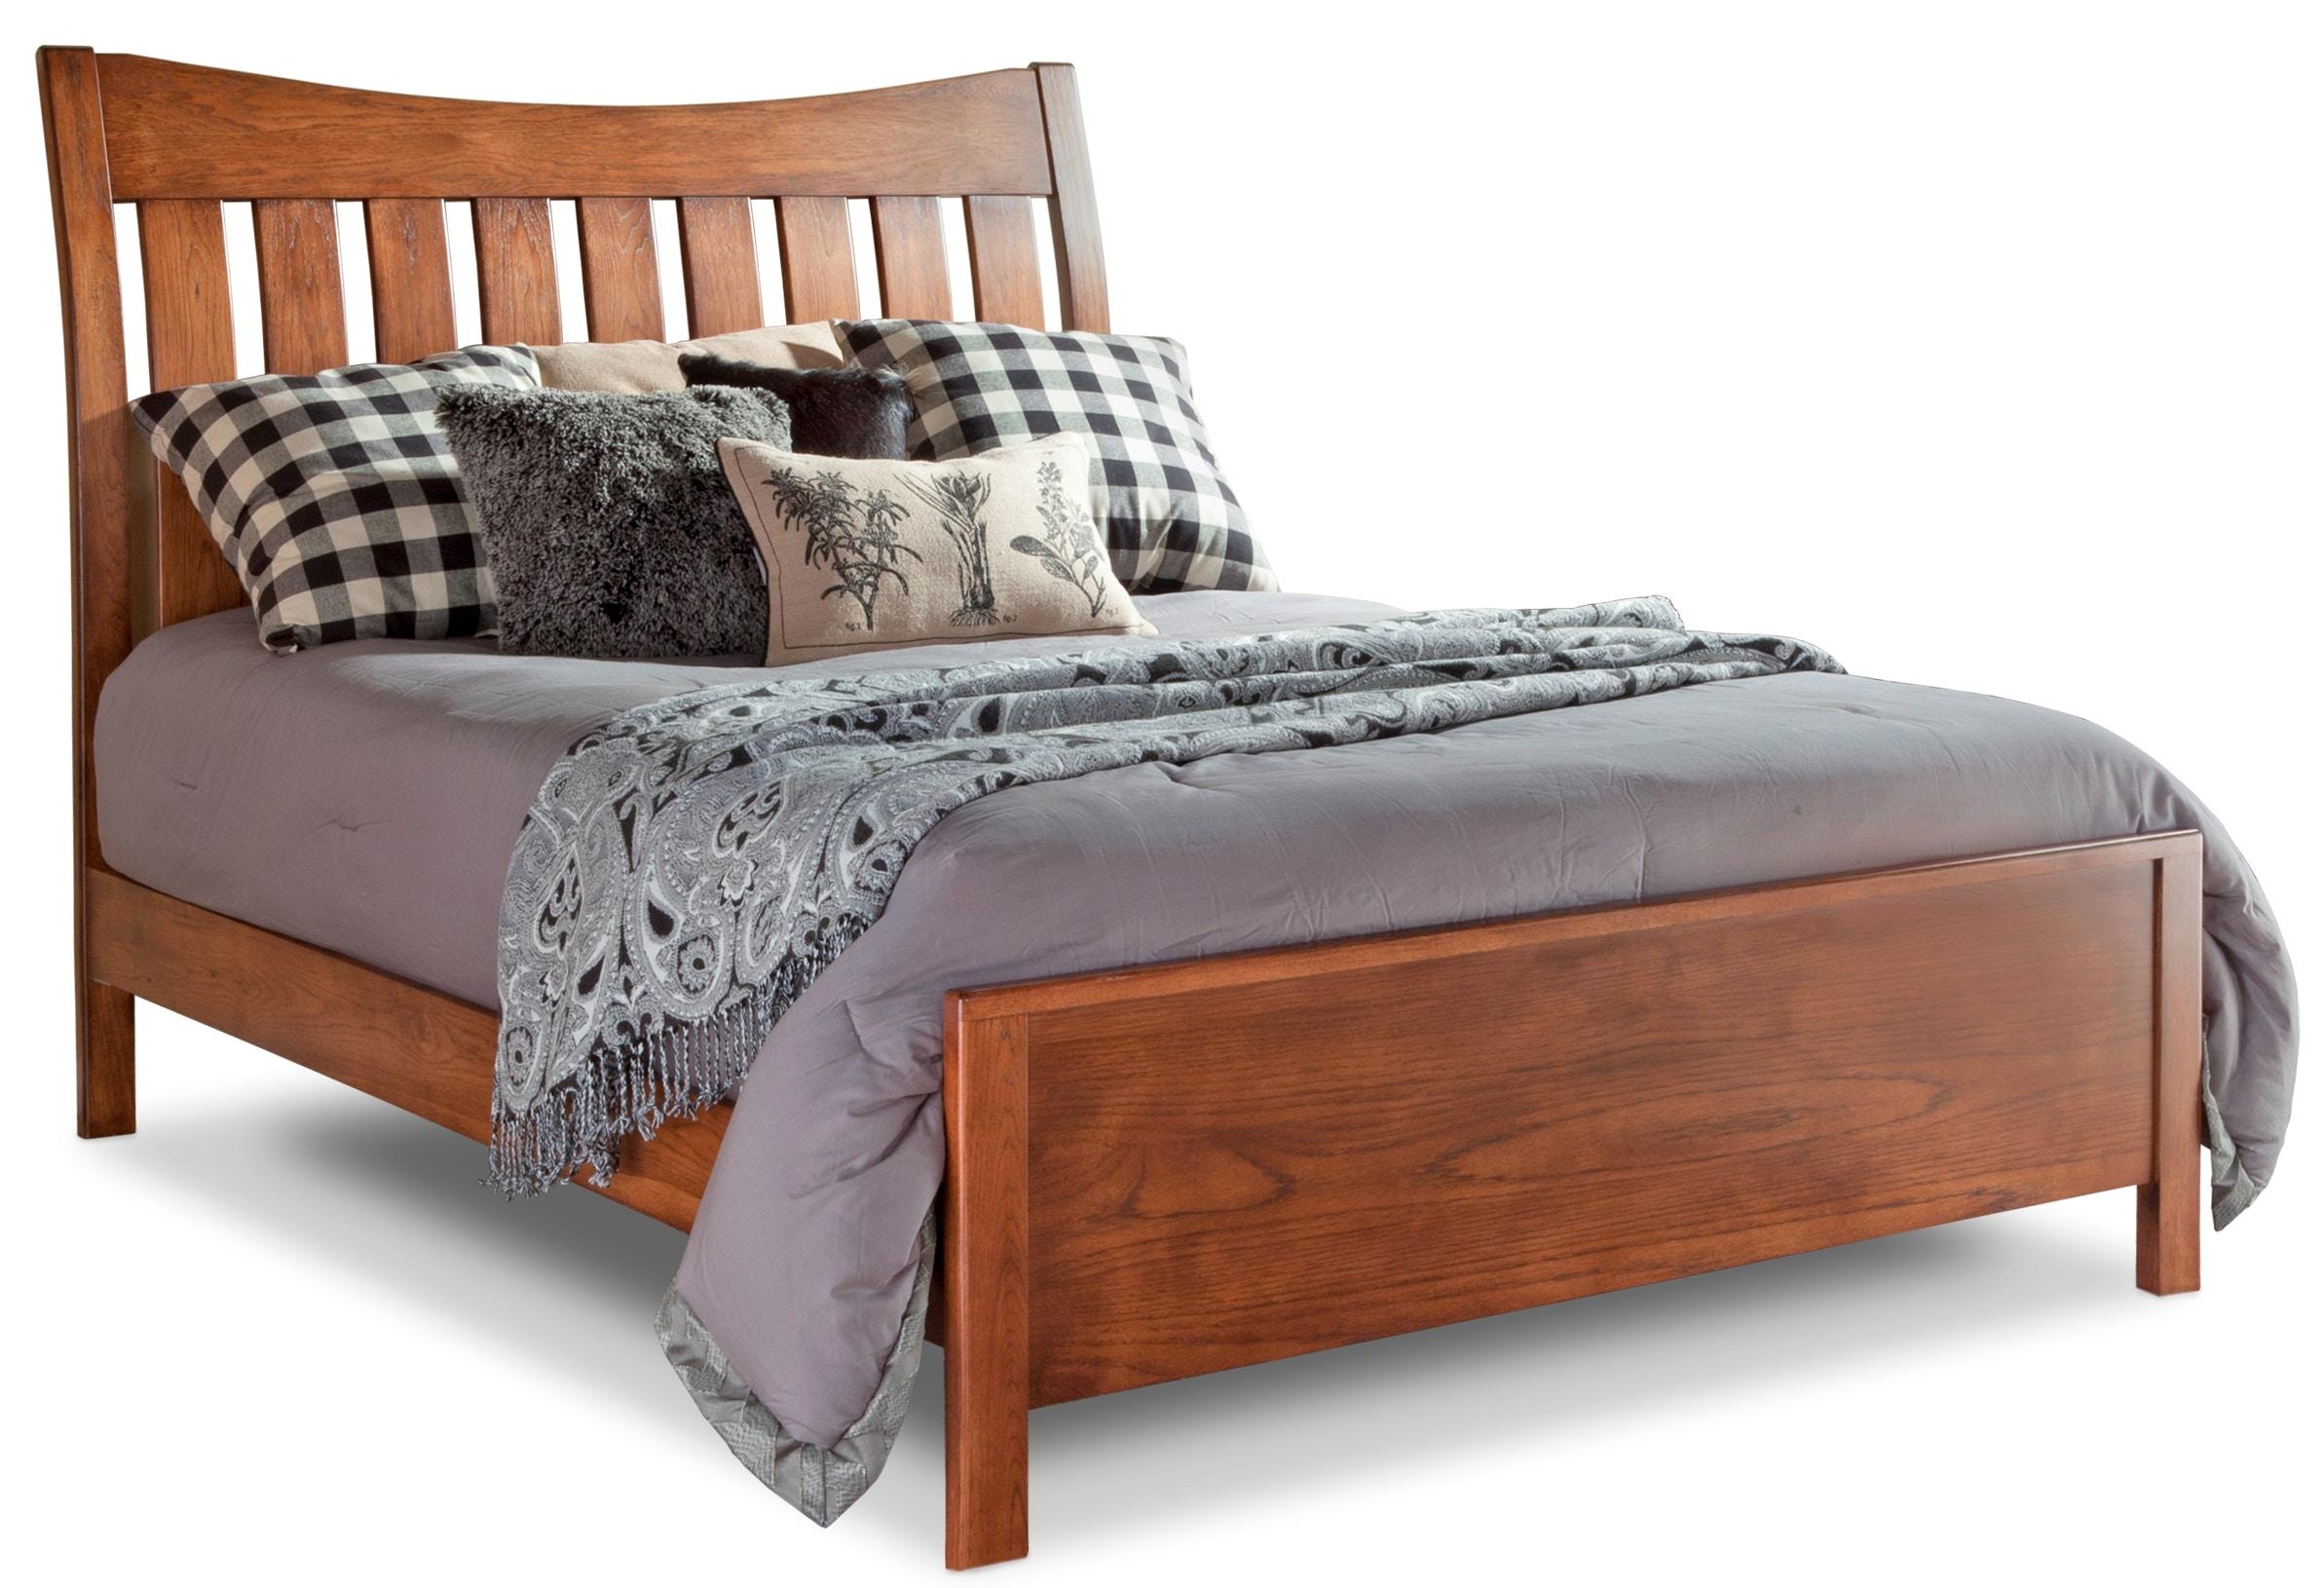 Bedroom Beds American Oak And More Montgomery Al